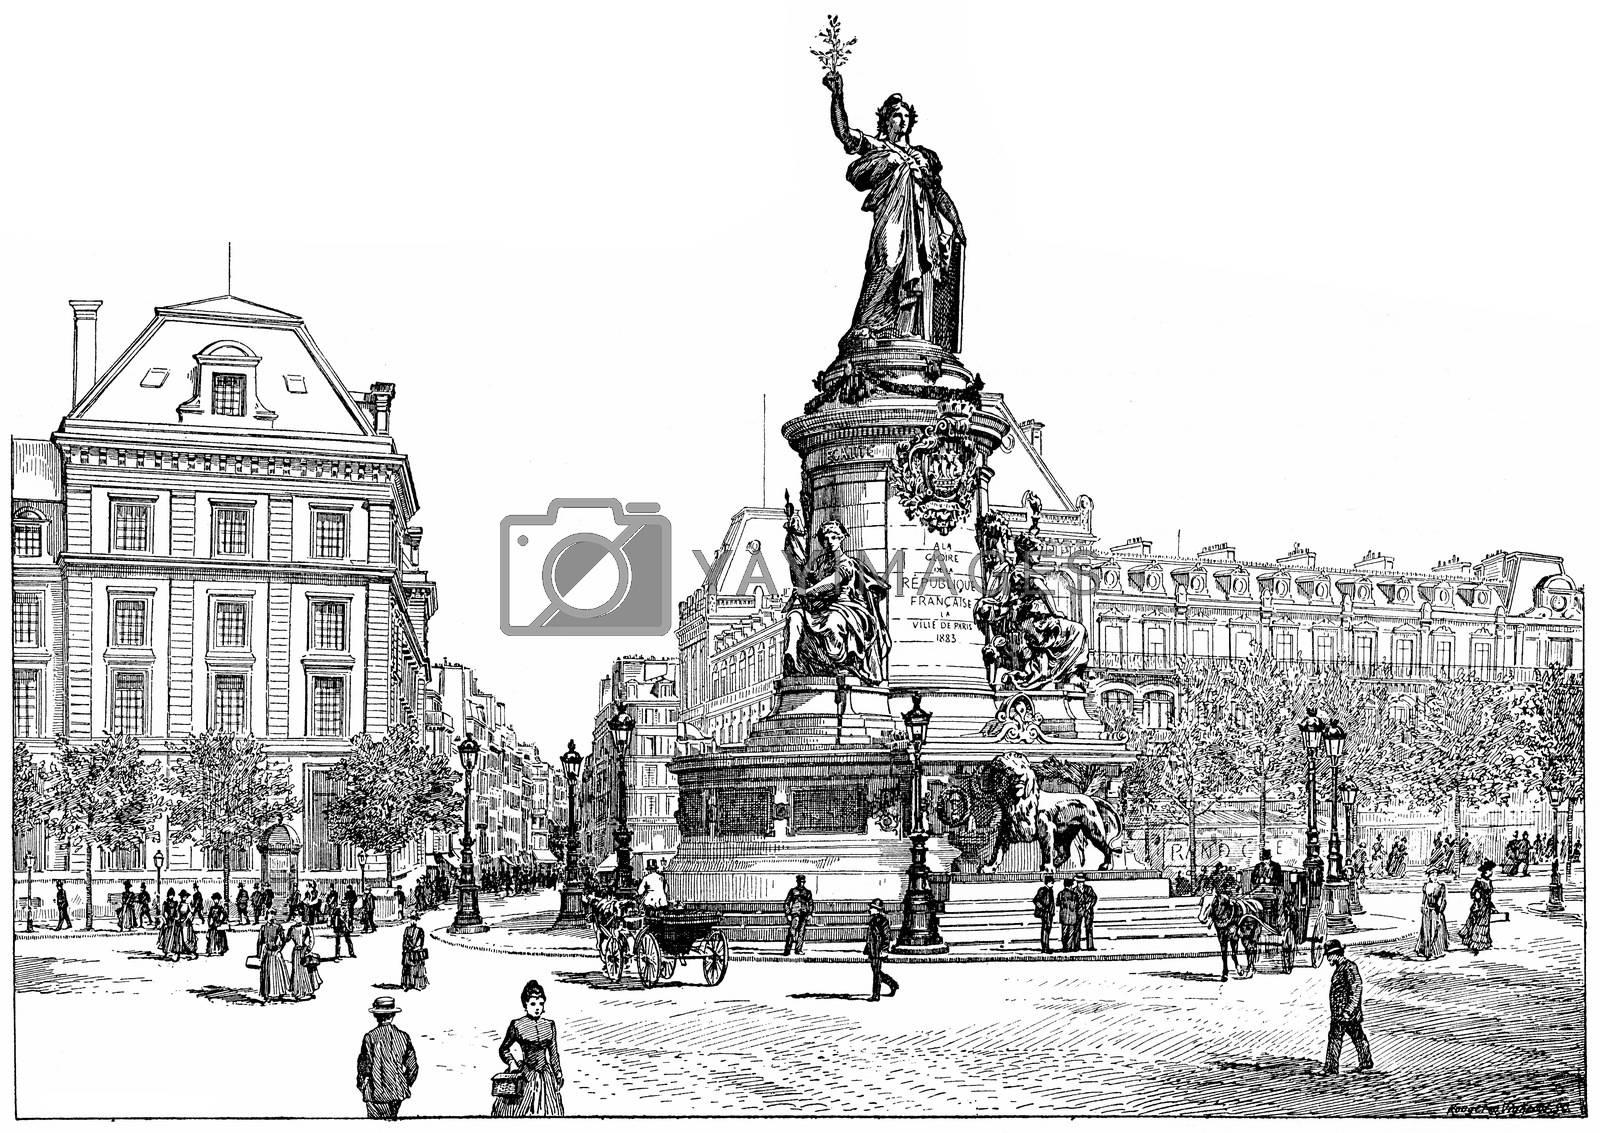 Republic Square, vintage engraving. by Morphart